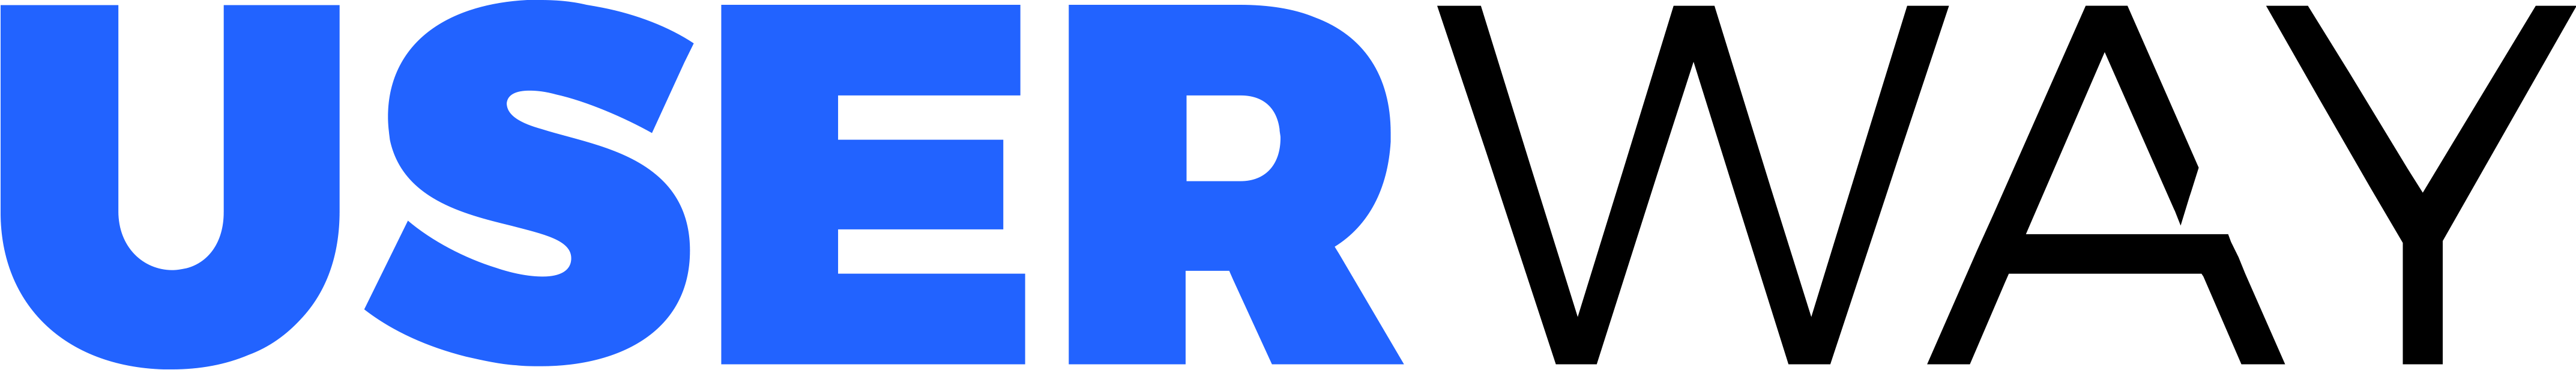 userway logo